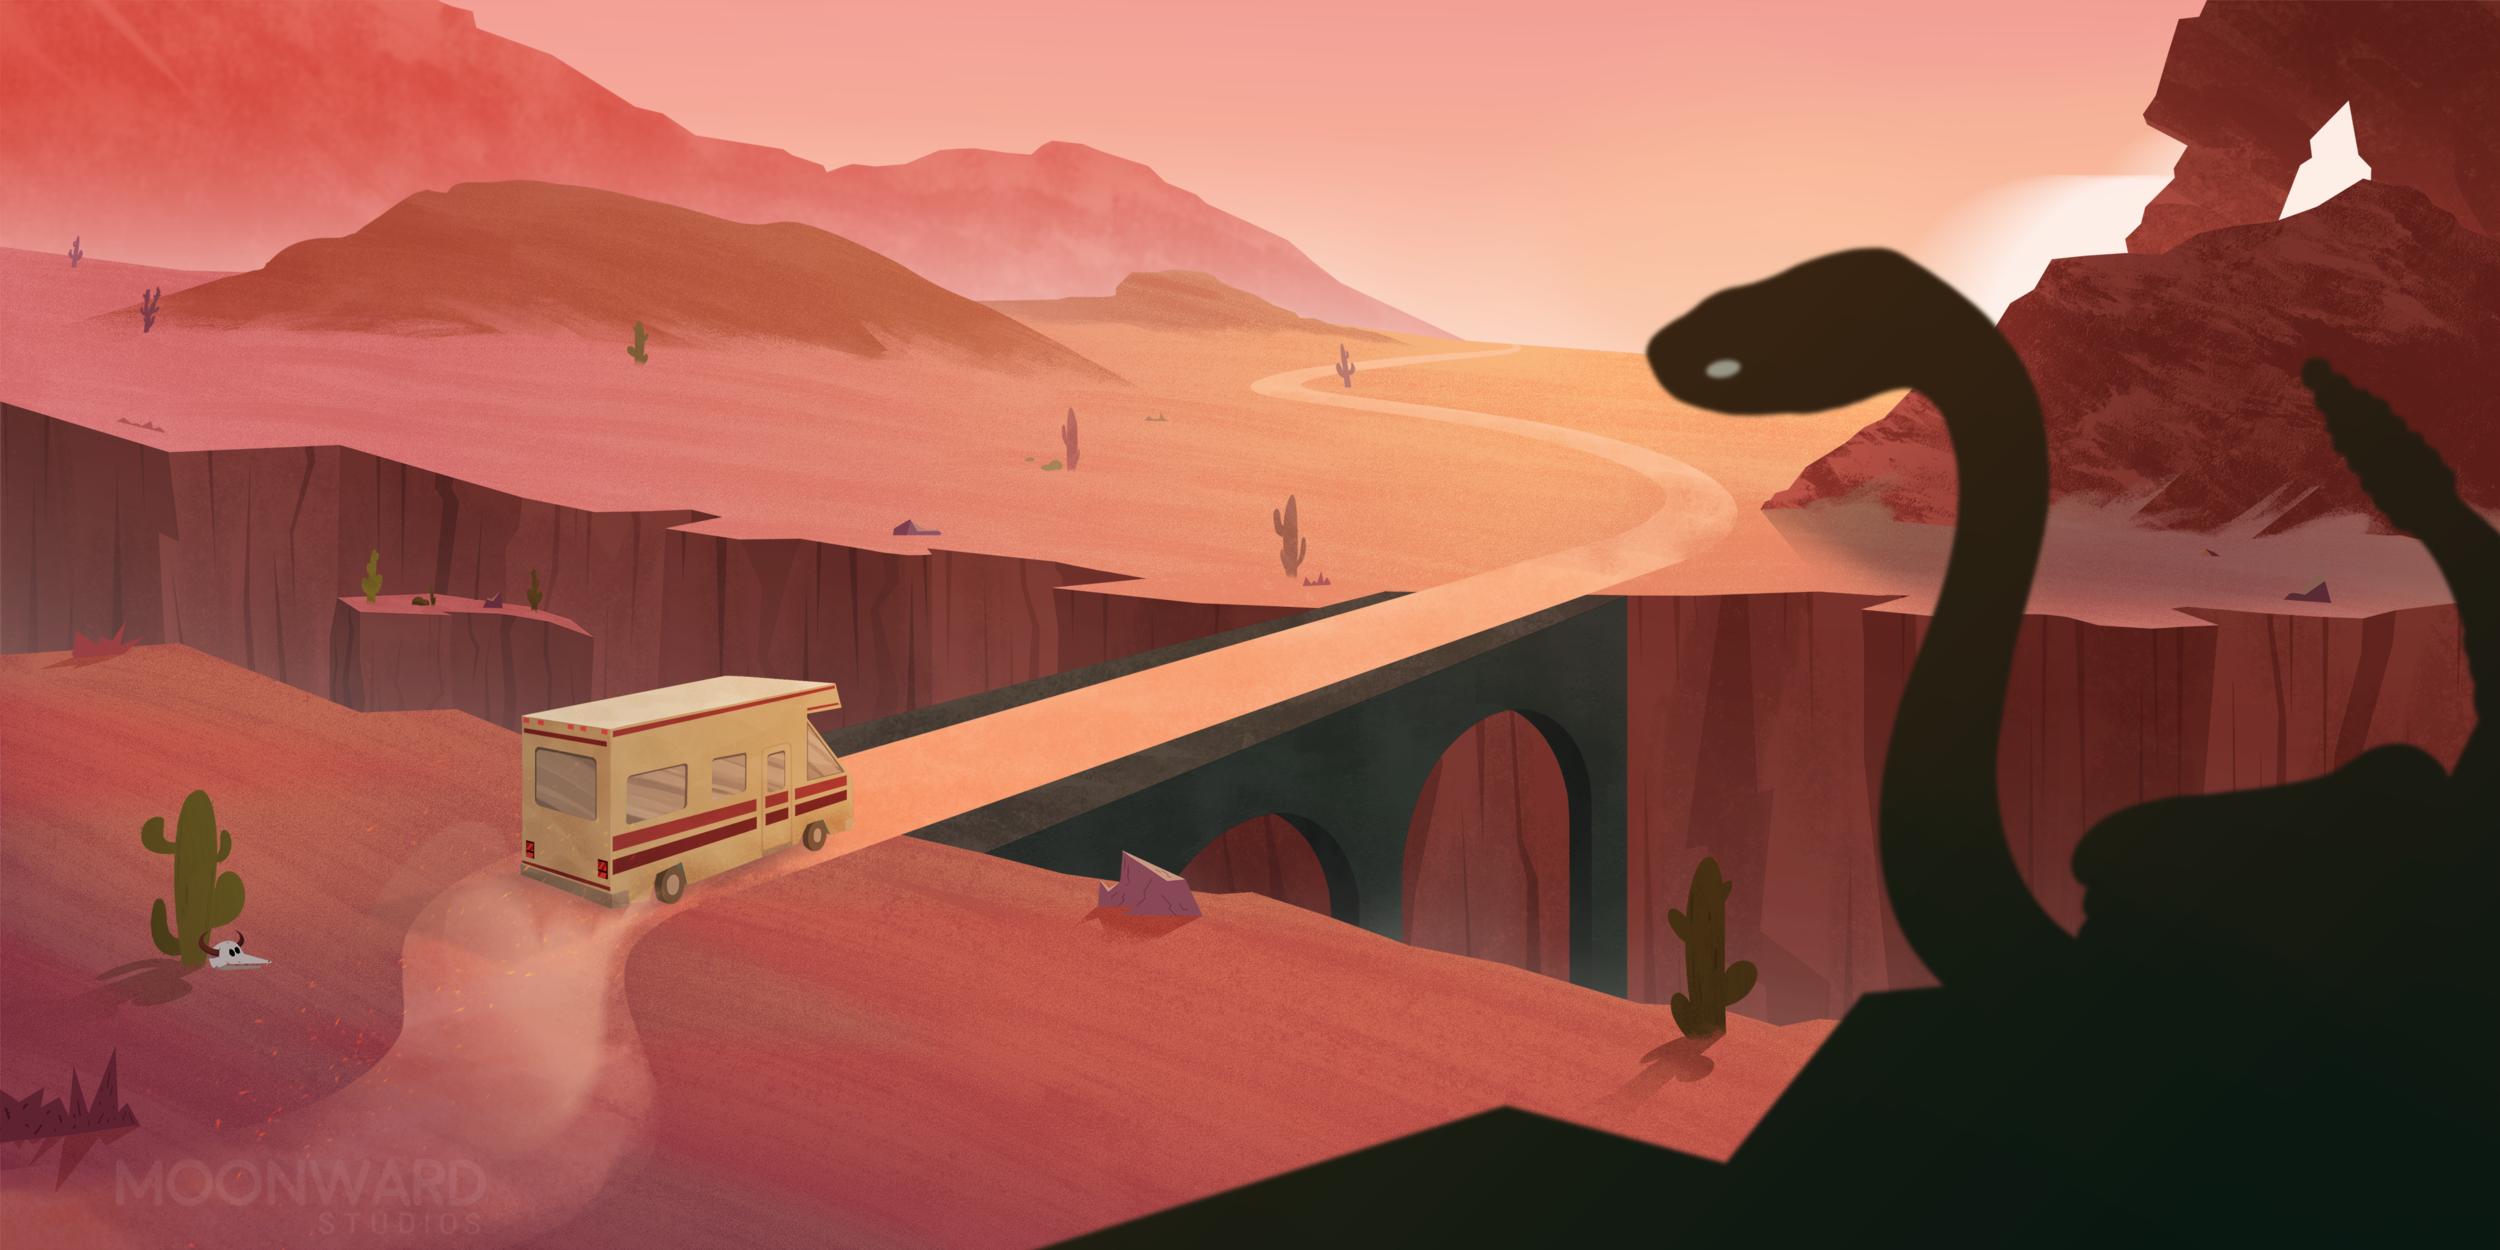 Desert Travel_moonward.png